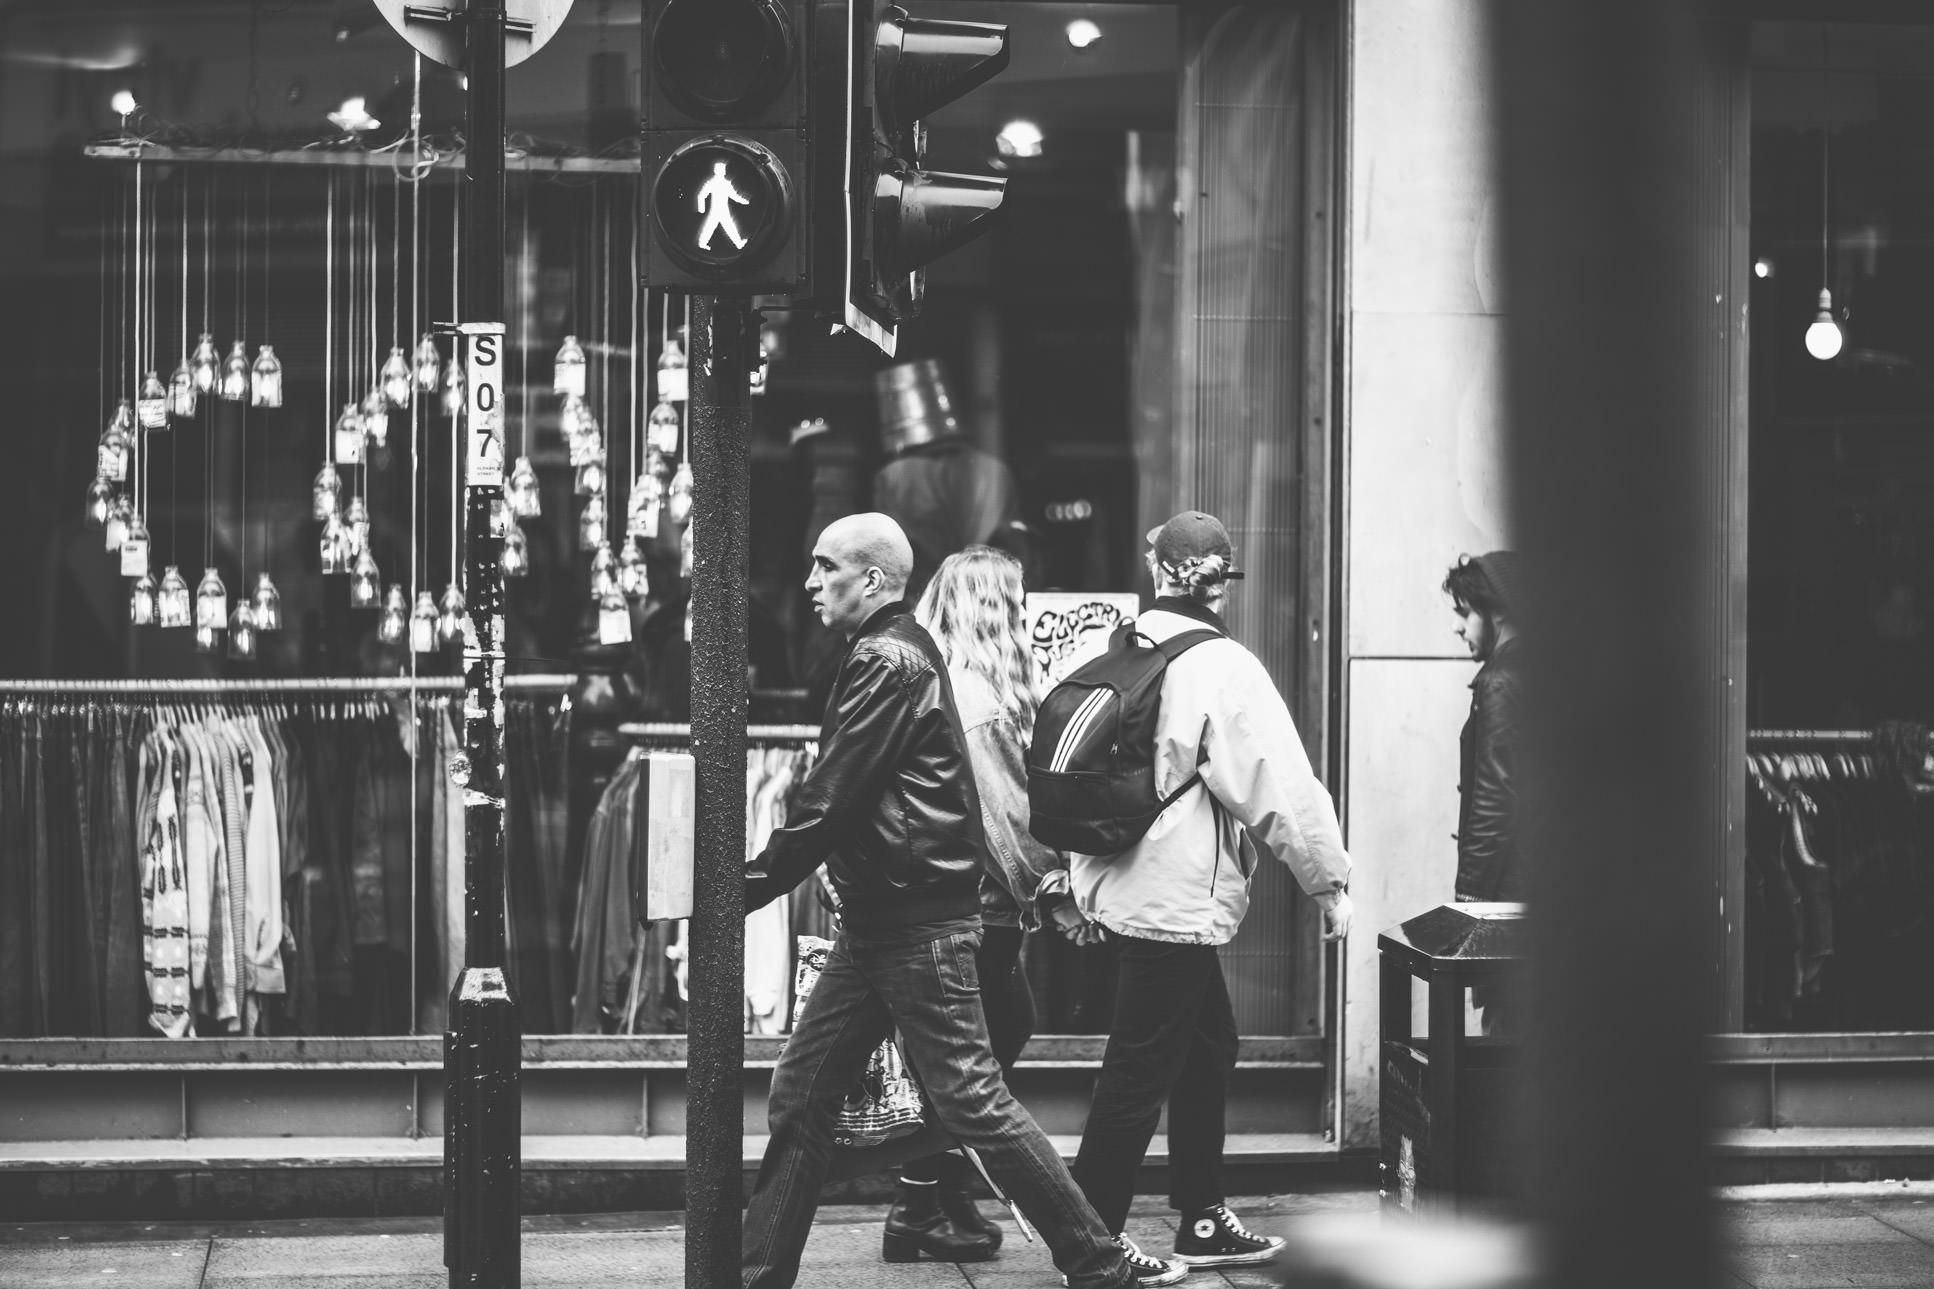 Street Photography7